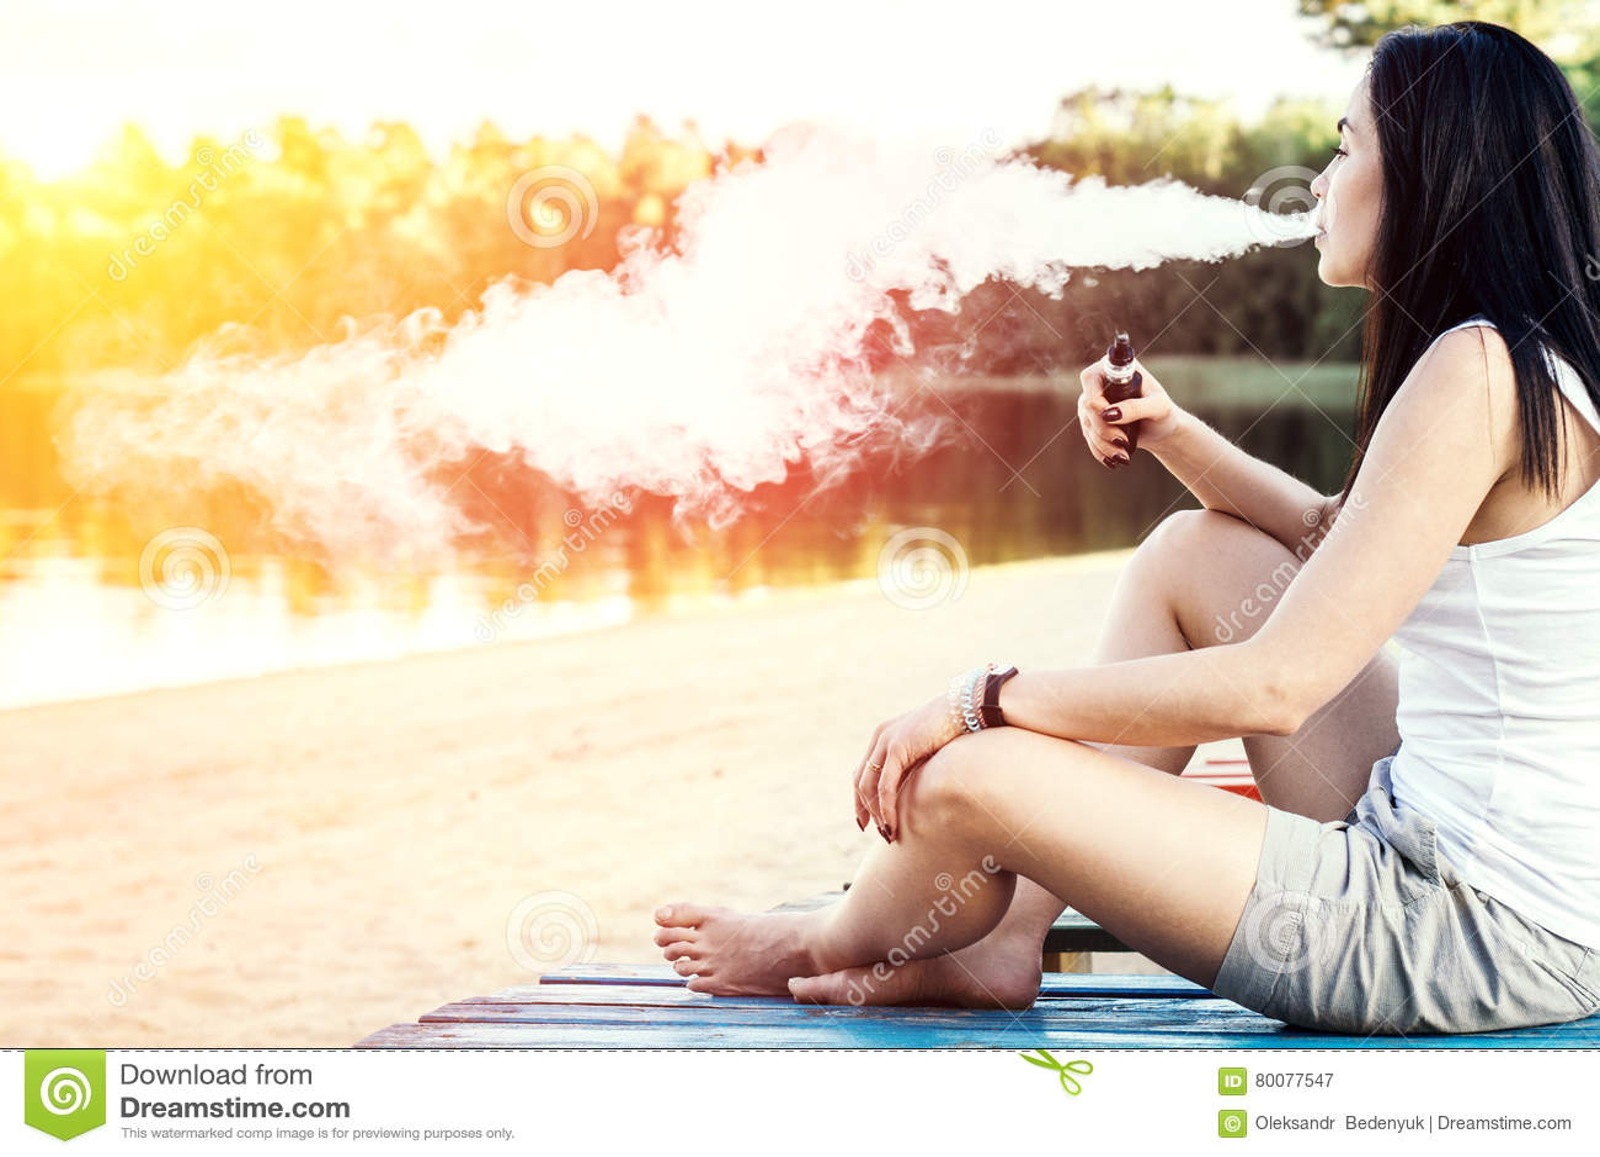 Long hair brunette girl smoking electronic cigarette on the beach